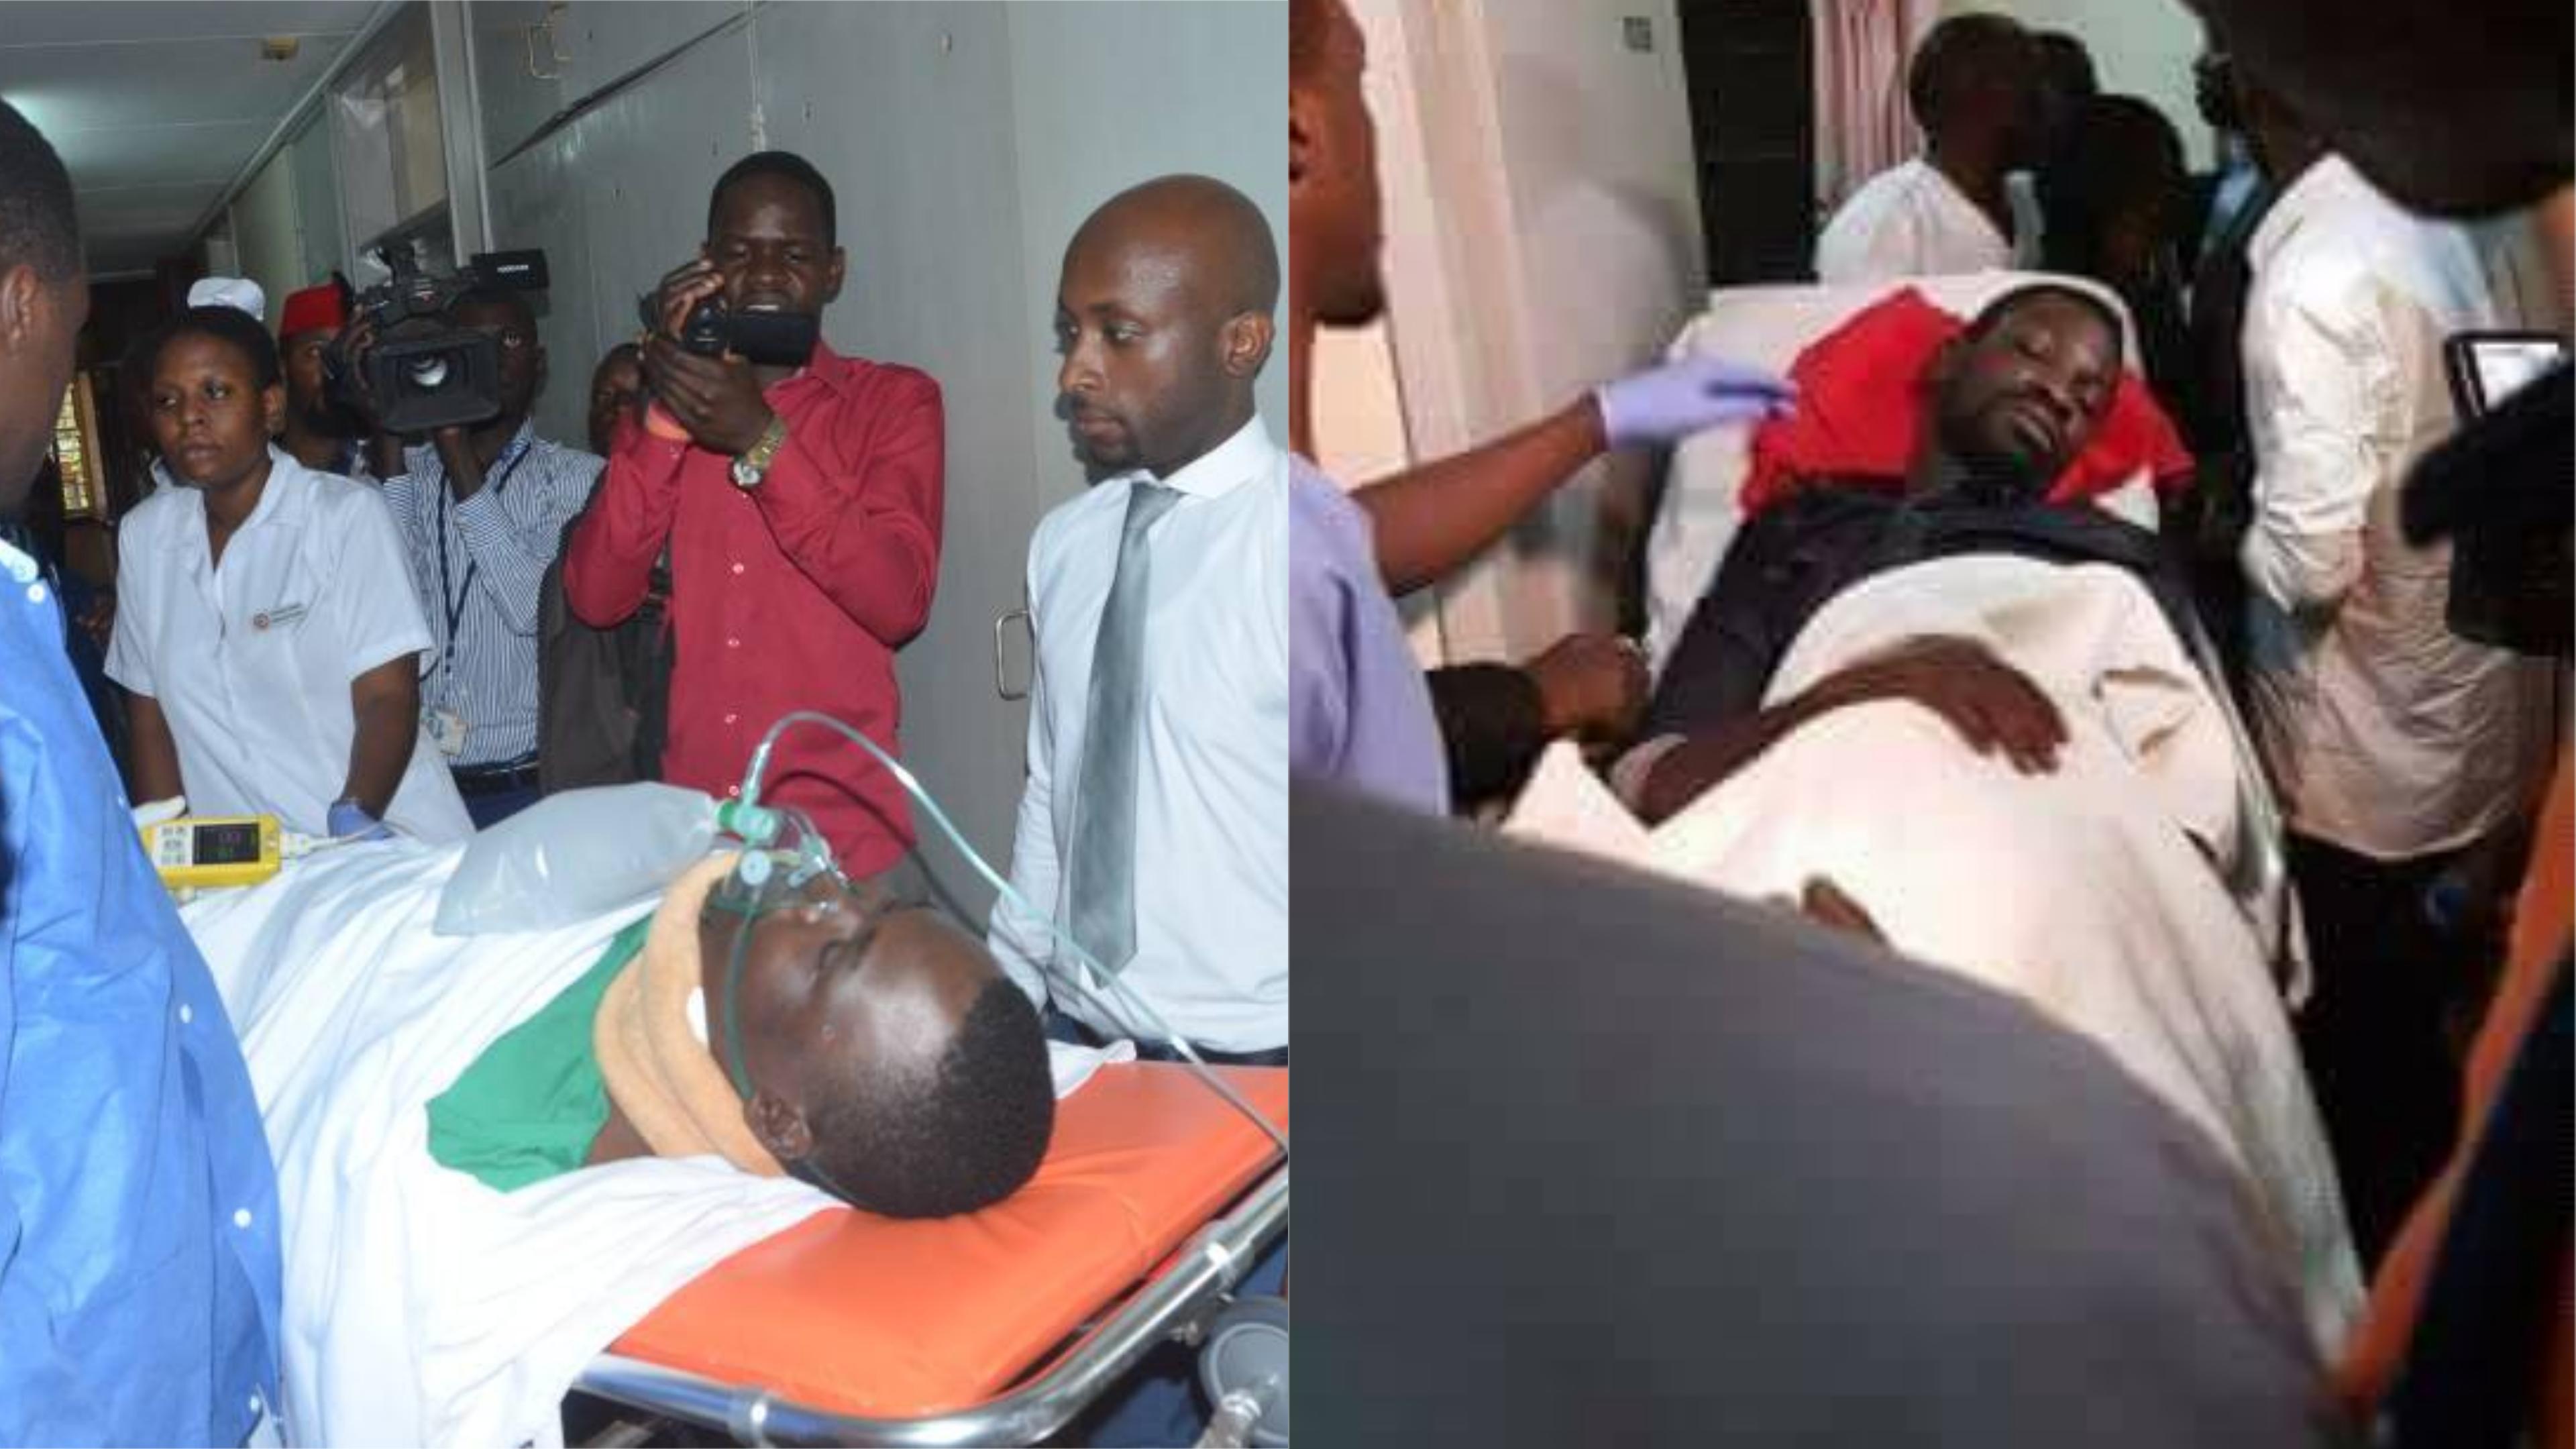 Following medical examinations, Kyadondo East MP Robert Kyagulanyi and Mityana Municipality MP Zaake Francis have been cleared to fly for medical treatment (FILE PHOTO)